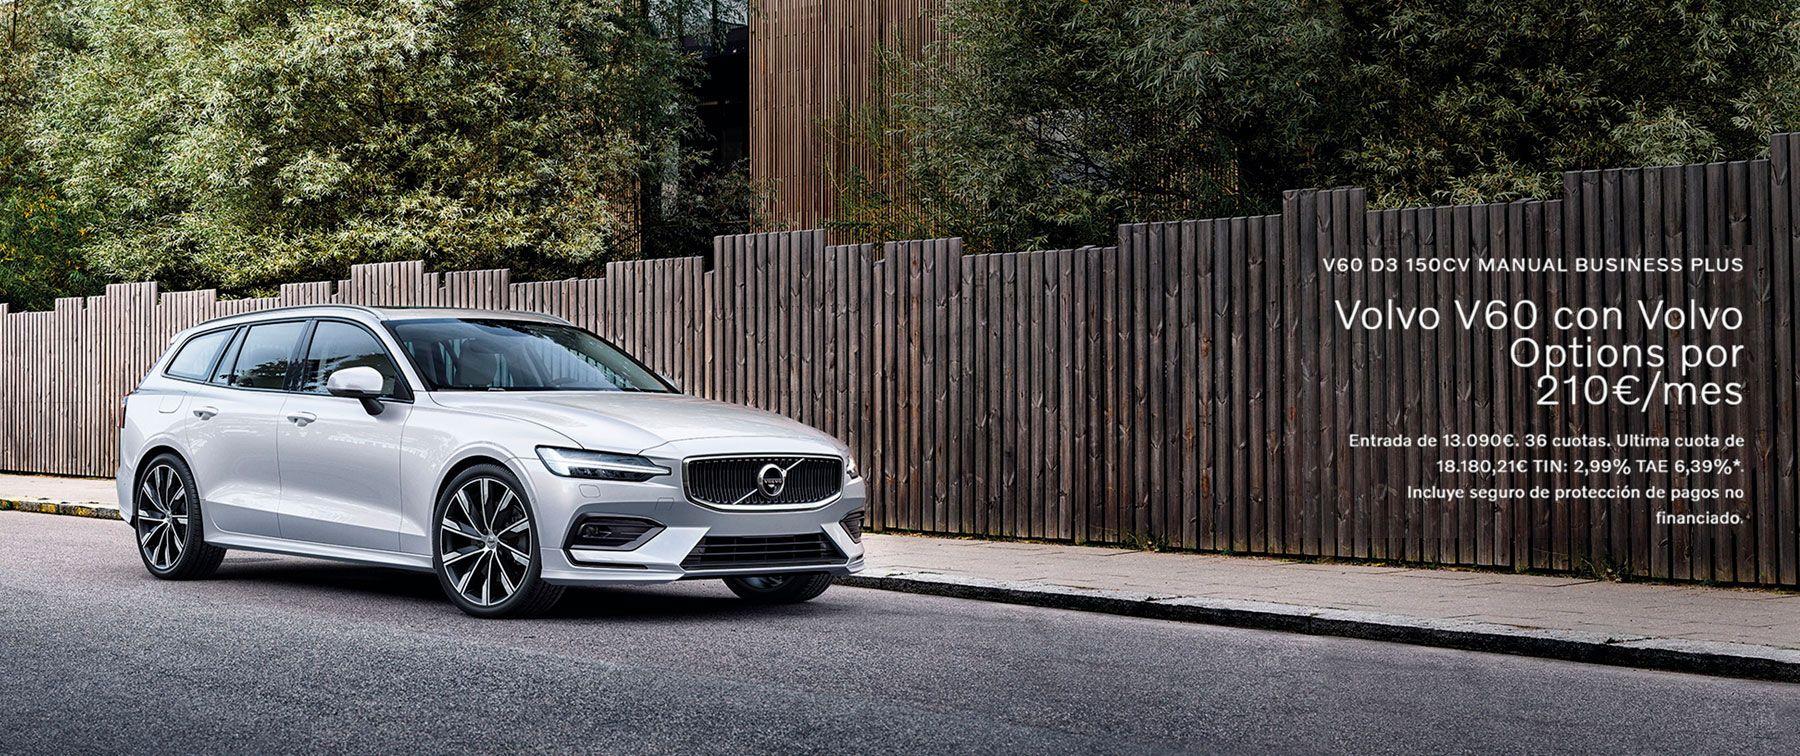 Volvo V60 con Volvo Options por 210€/mes